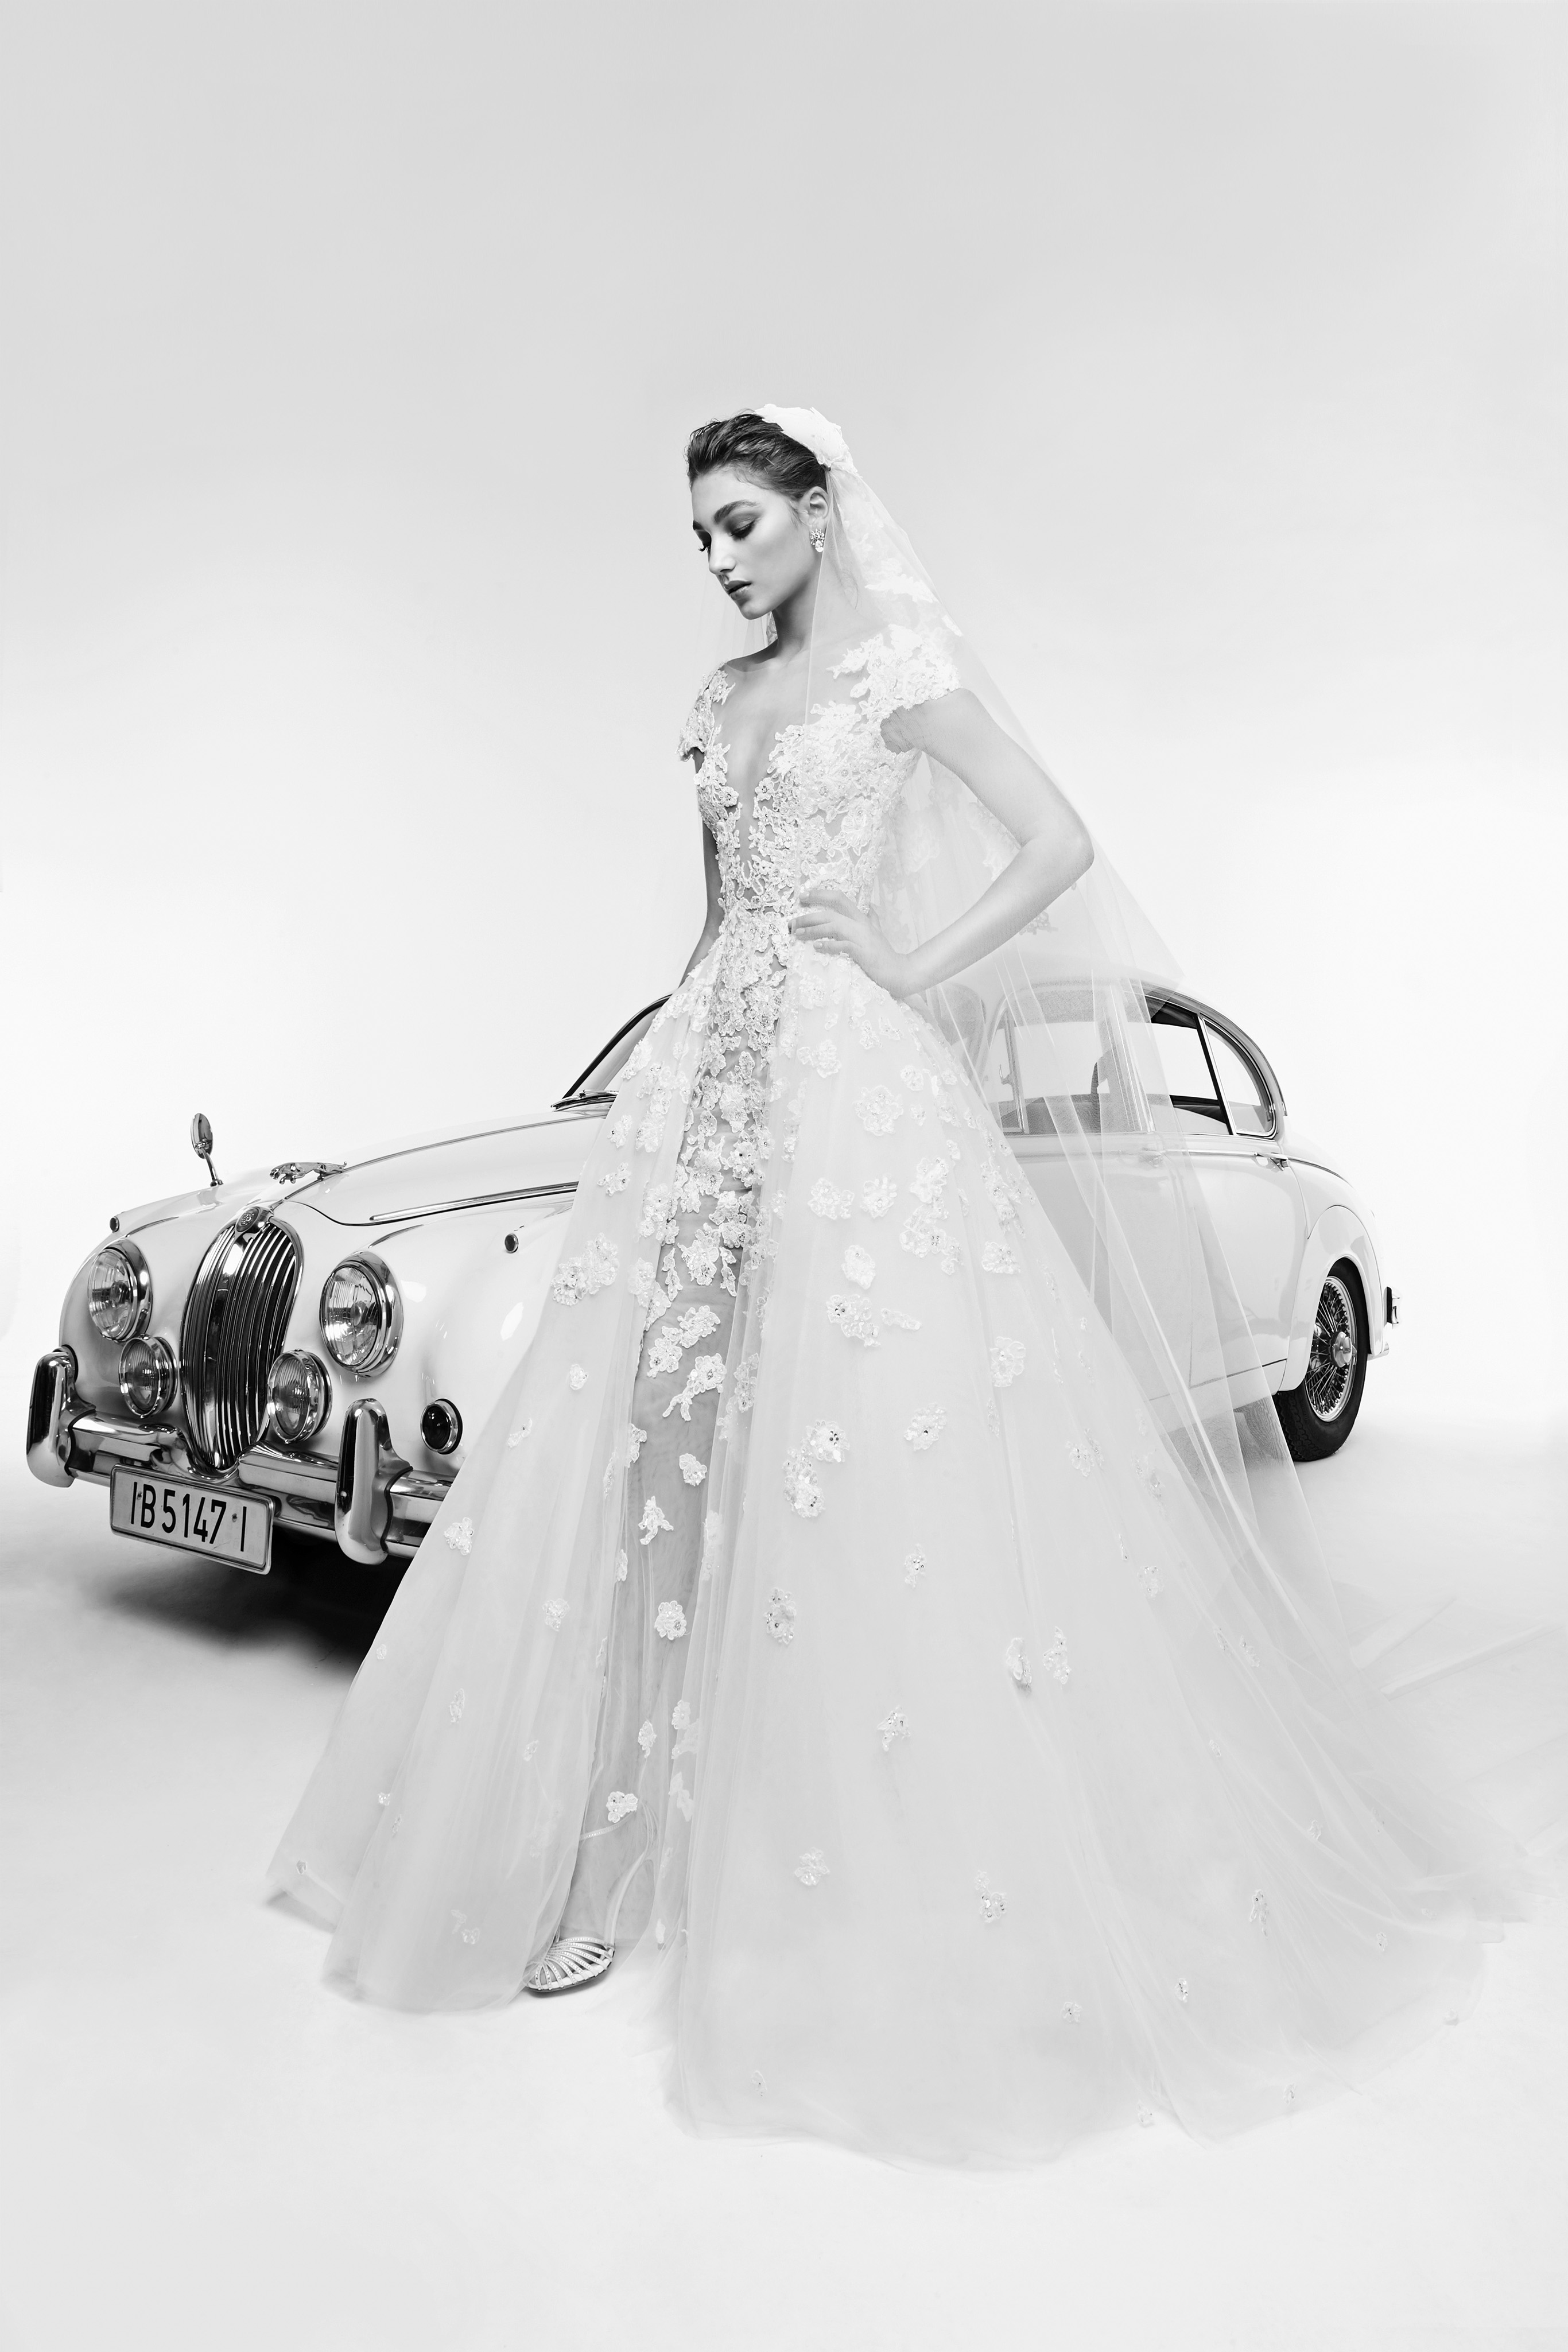 zuhair murad wedding dress spring 2019 floral v-neck with veil